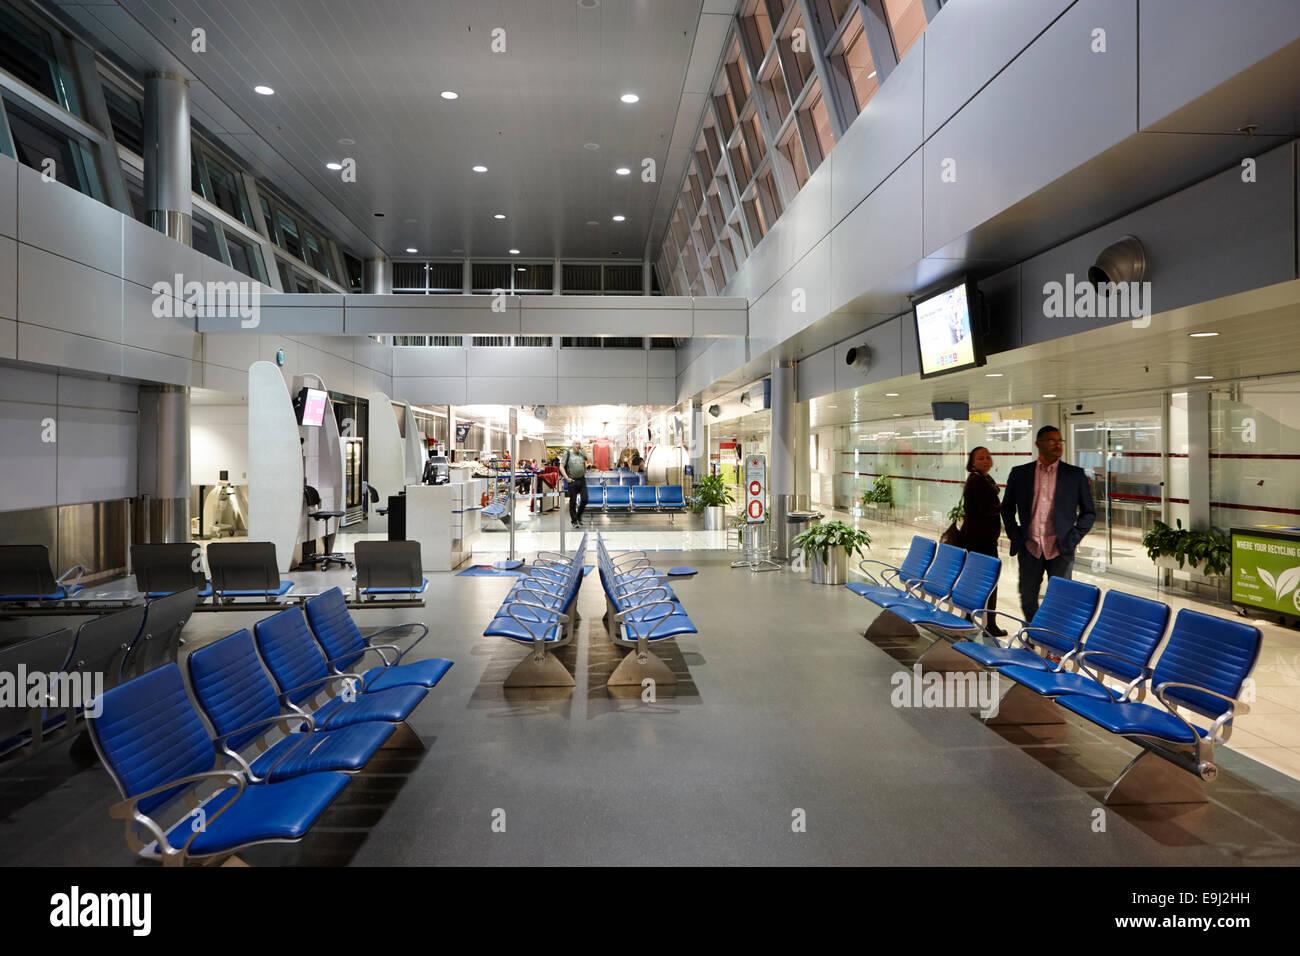 Sala de salidas del aeropuerto internacional de Saint John's newfoundland Canadá Imagen De Stock